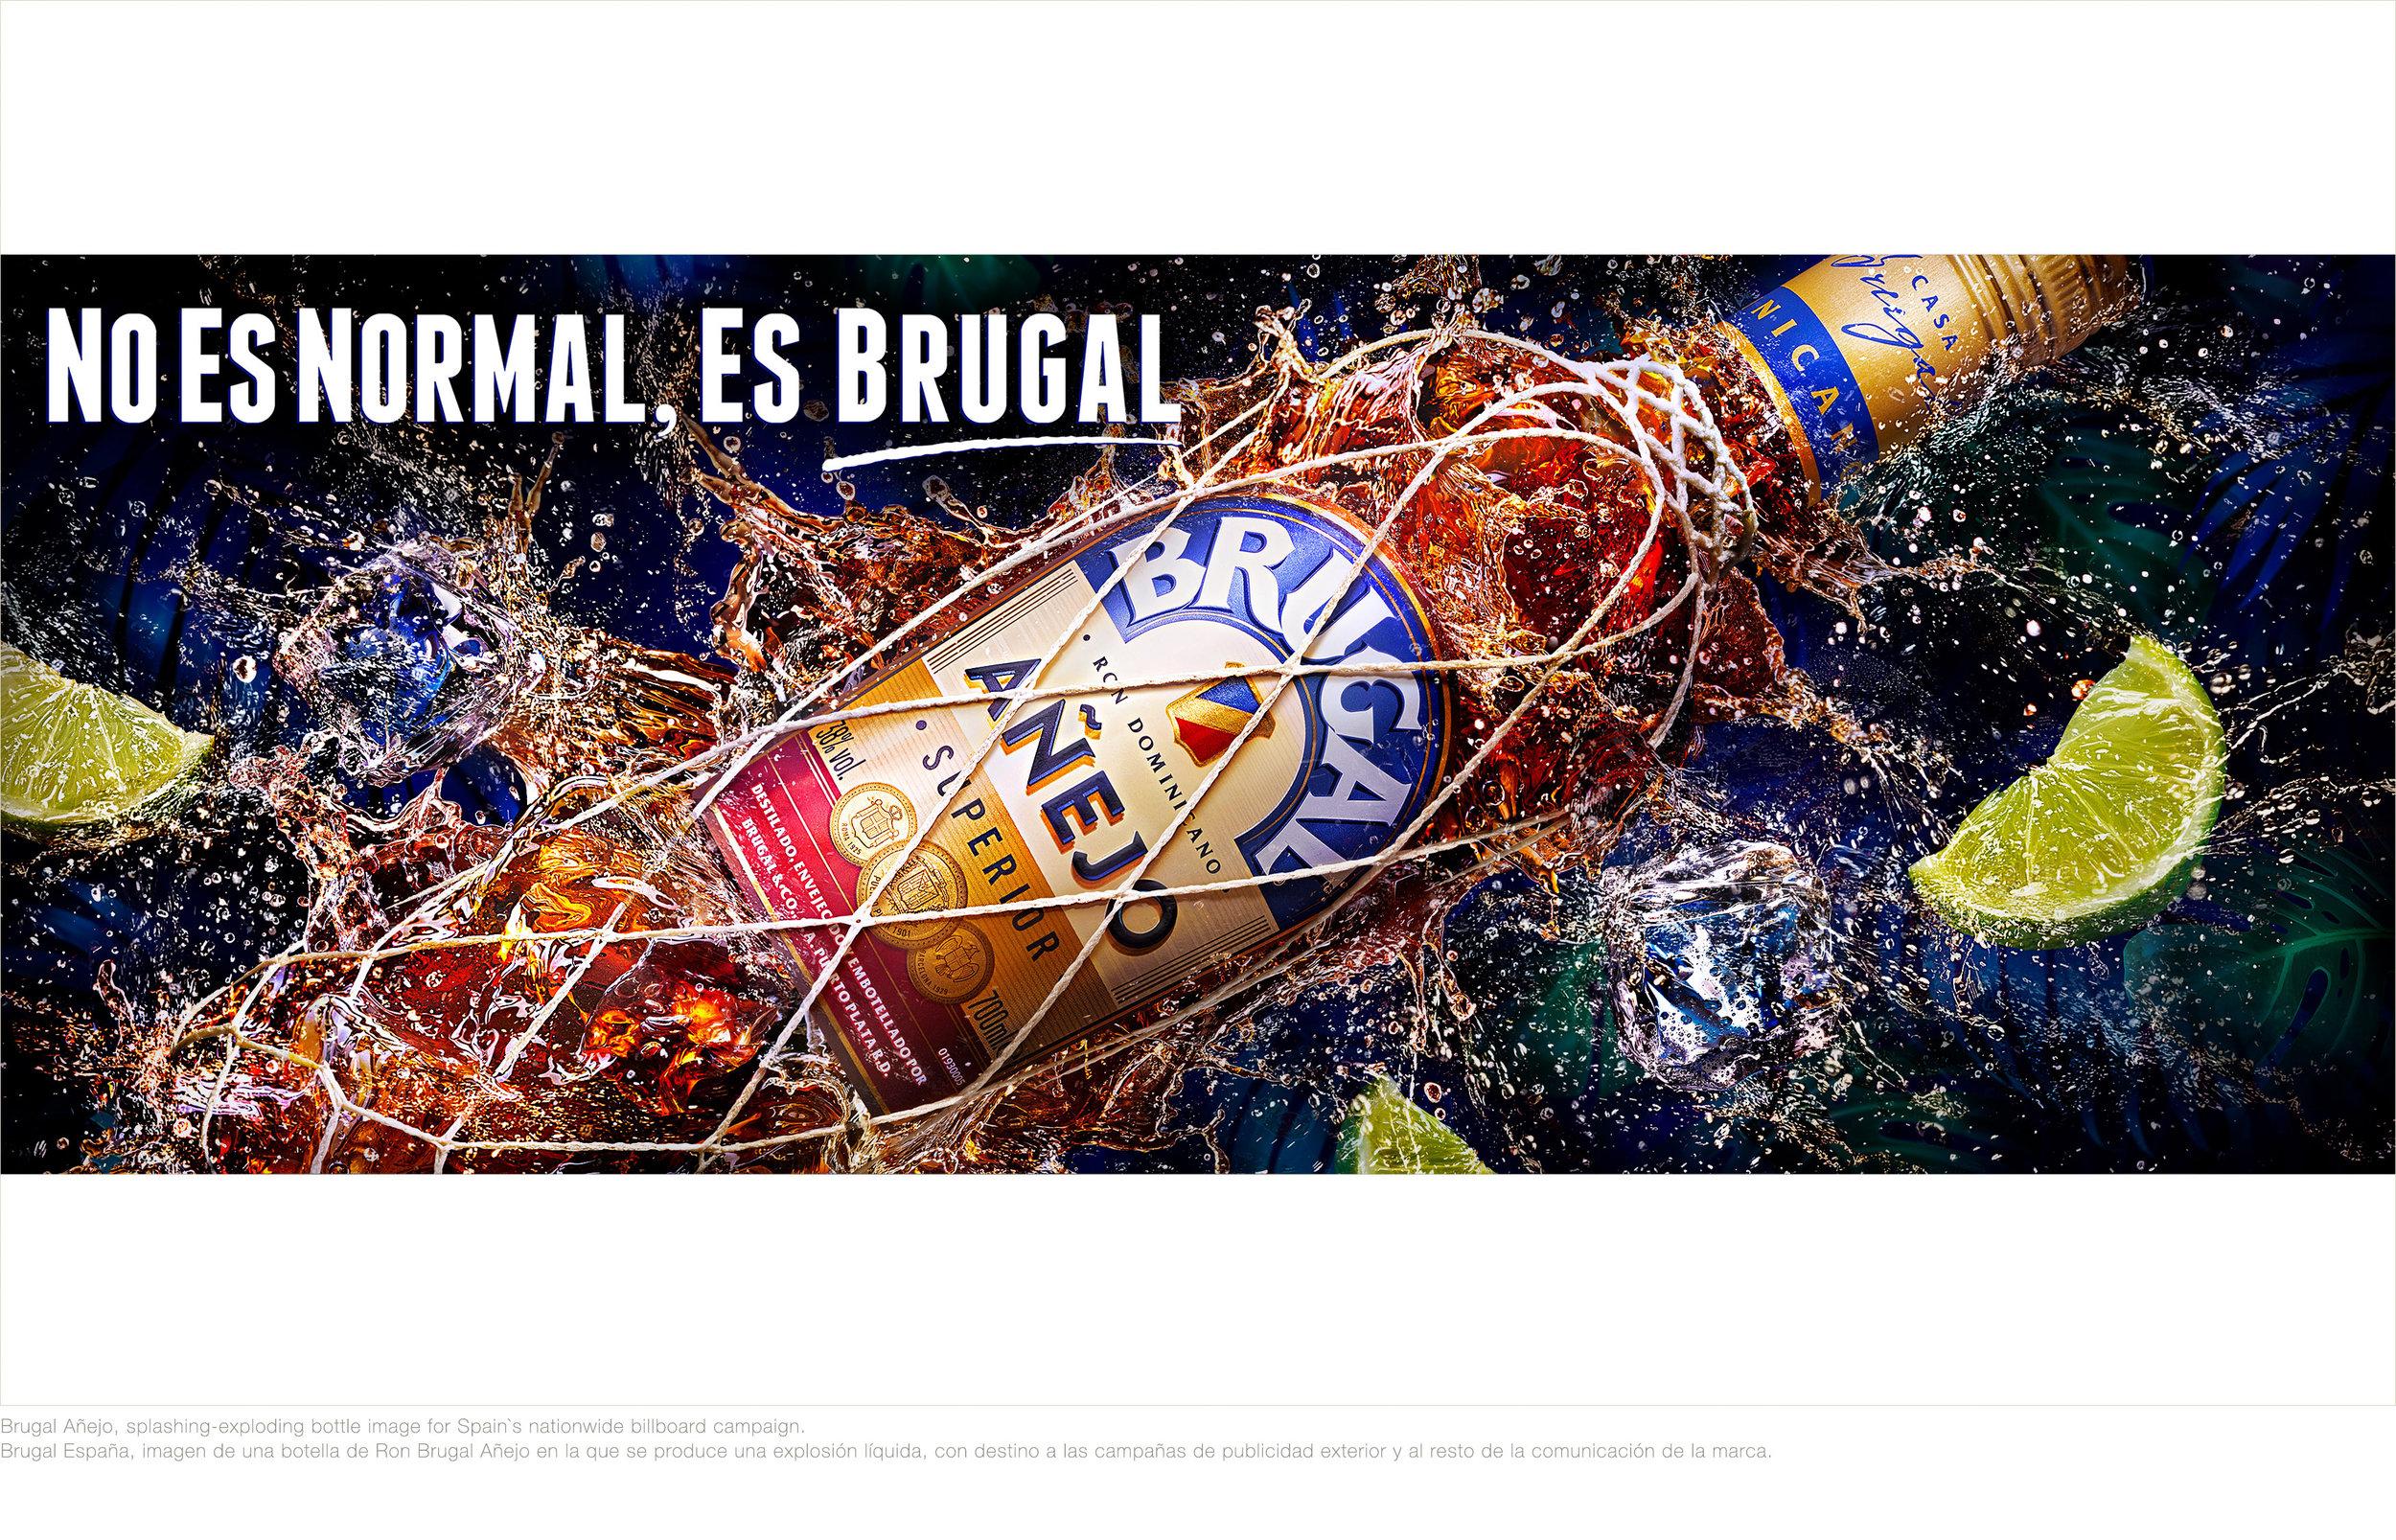 1611a-Brugal-BotellaExploding-2016-INT-02-20190610v06.jpg